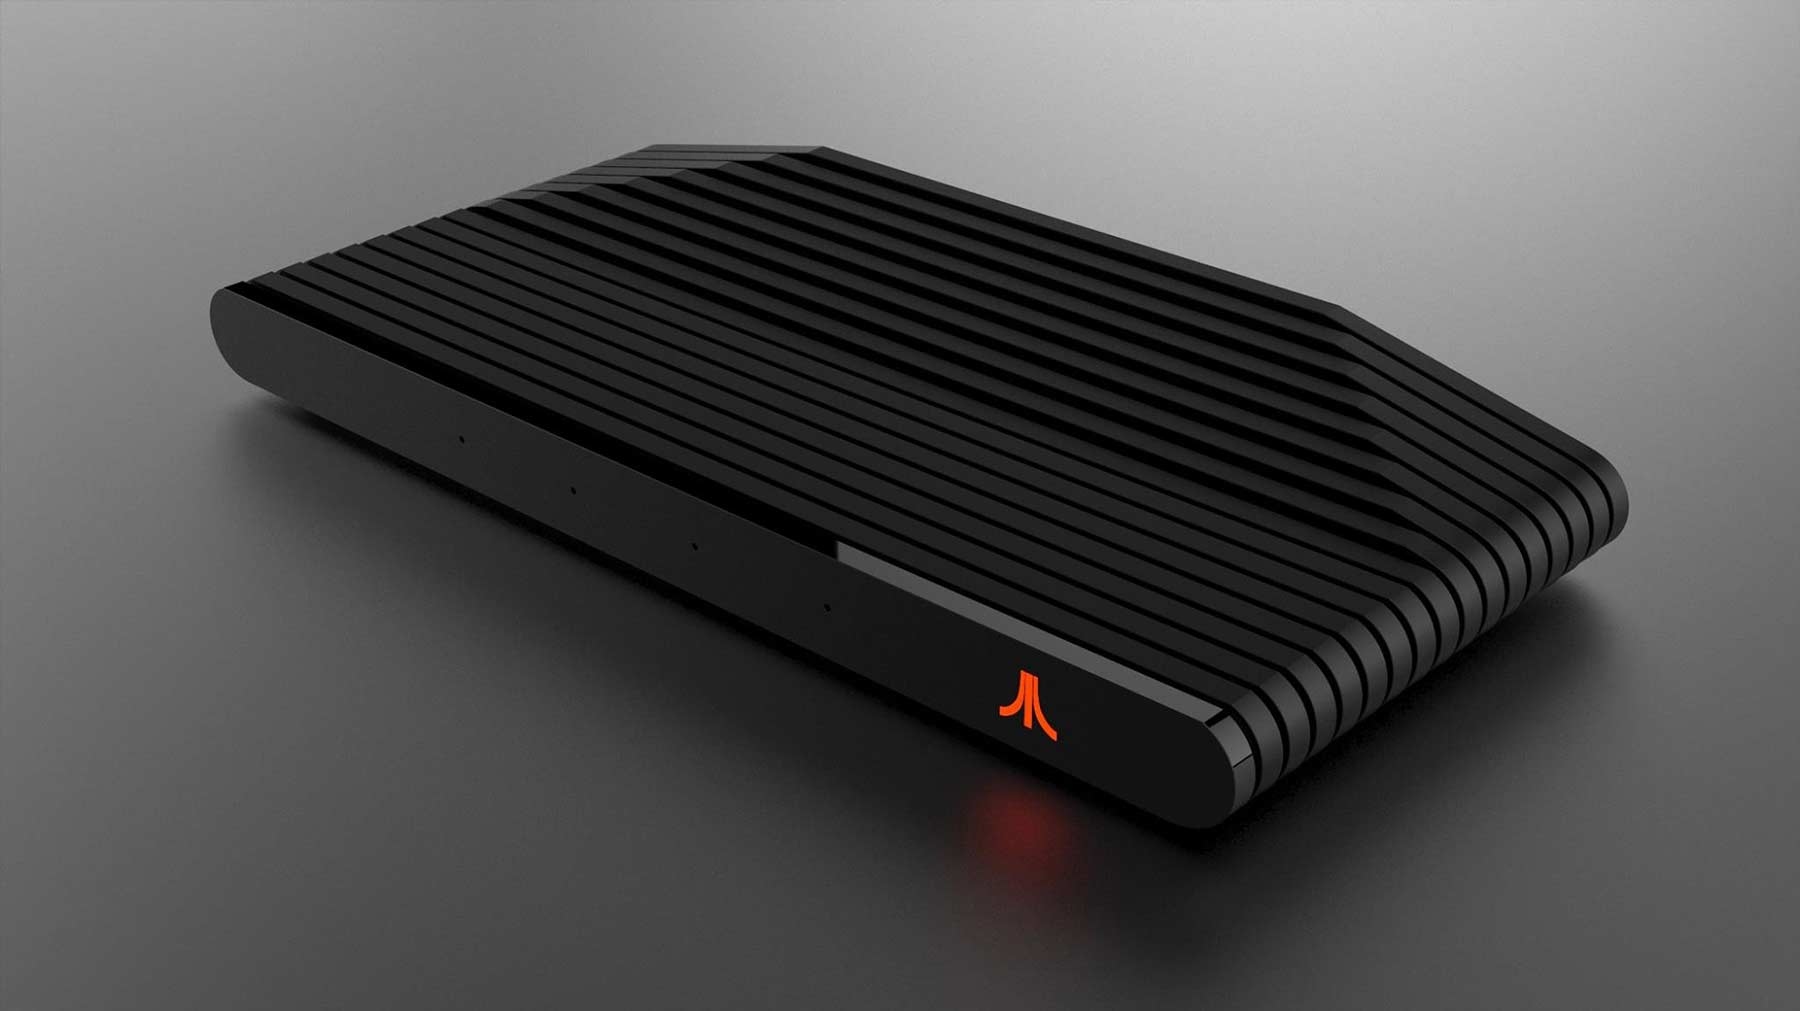 So soll die neue Atari-Konsole aussehen Ataribox_03